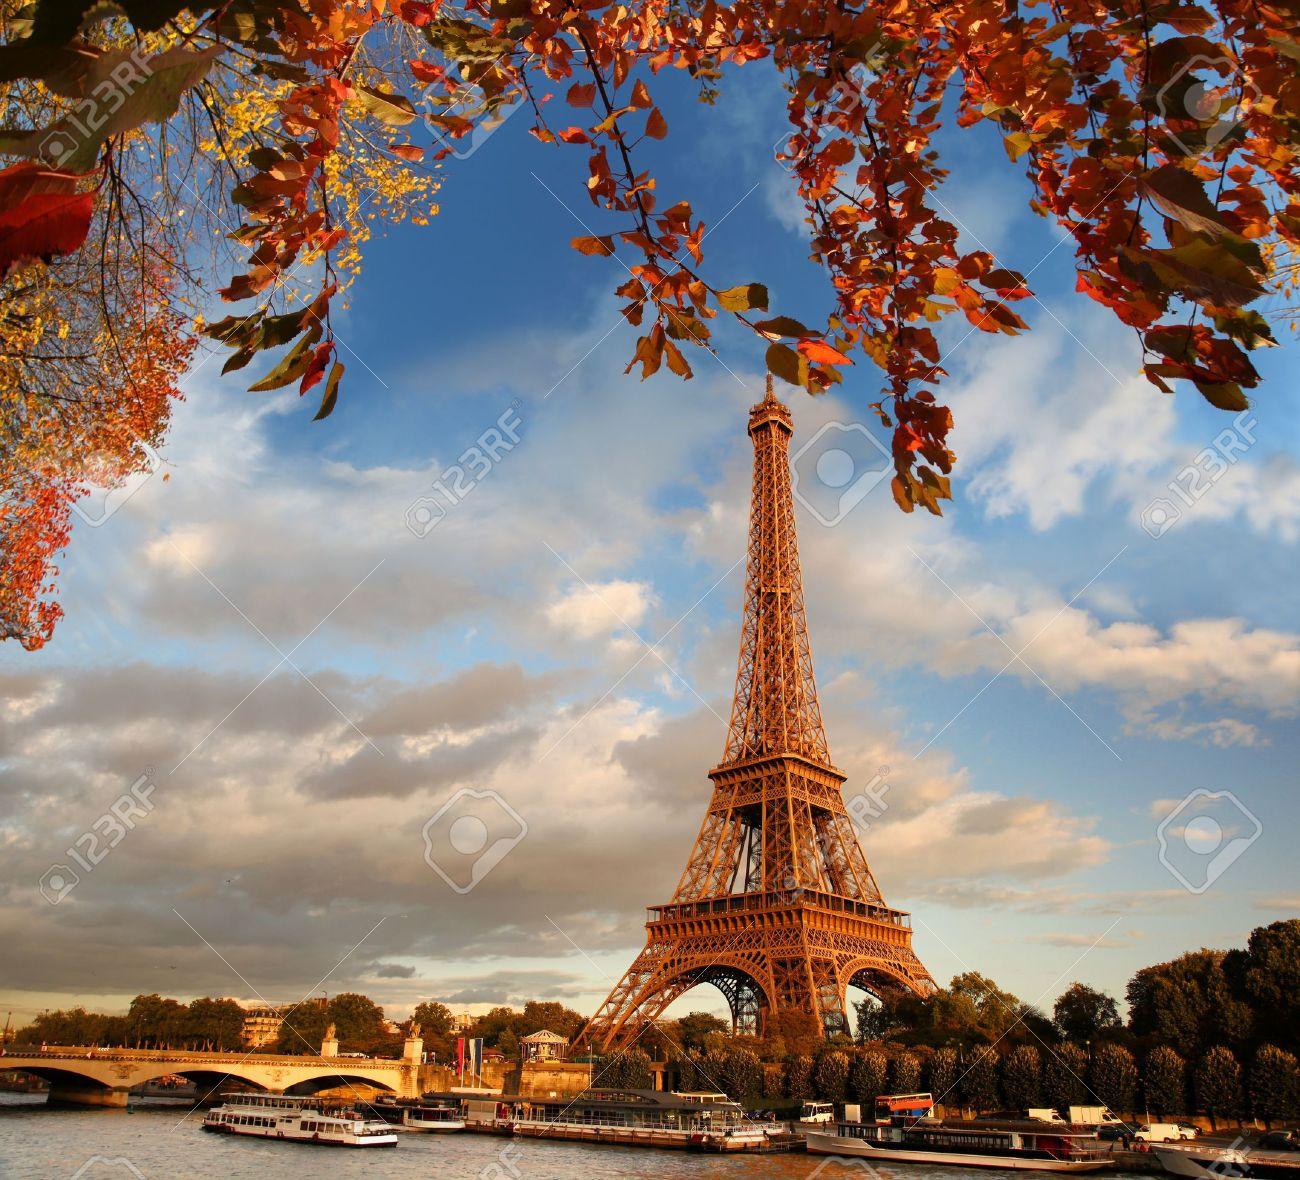 Eiffel Tower in autumn, Paris, France - 20923624